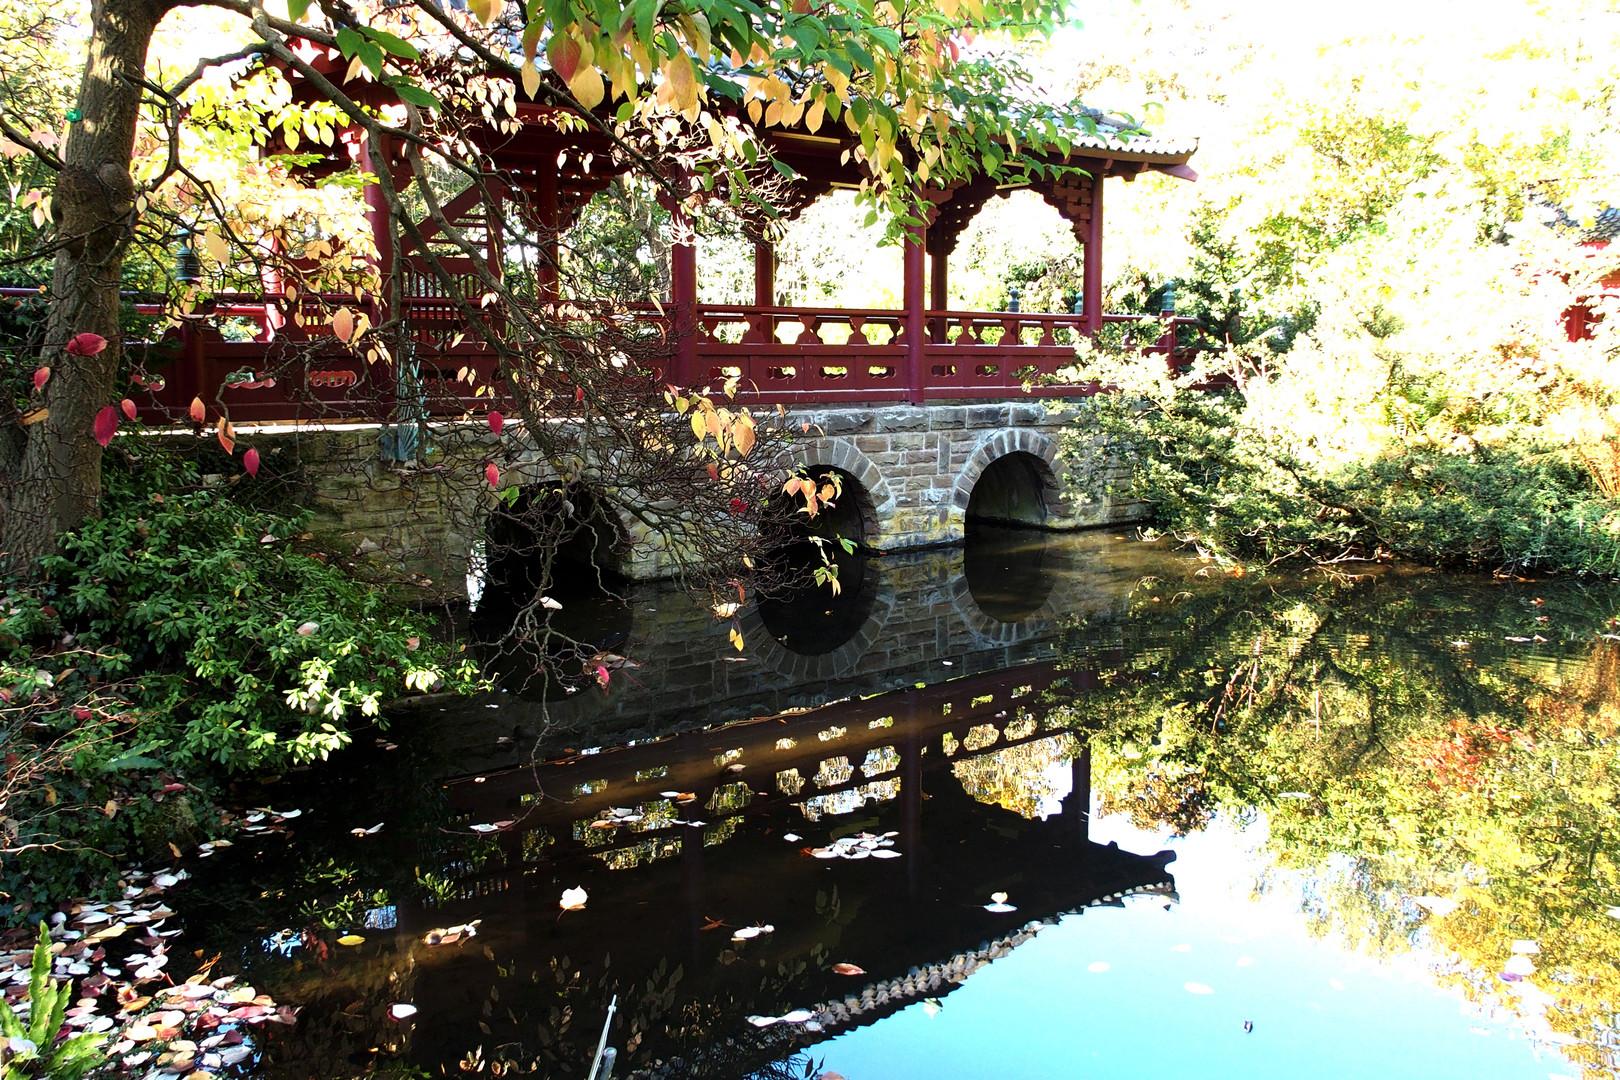 Japan Garten Leverkusen Foto Bild Landschaft Garten